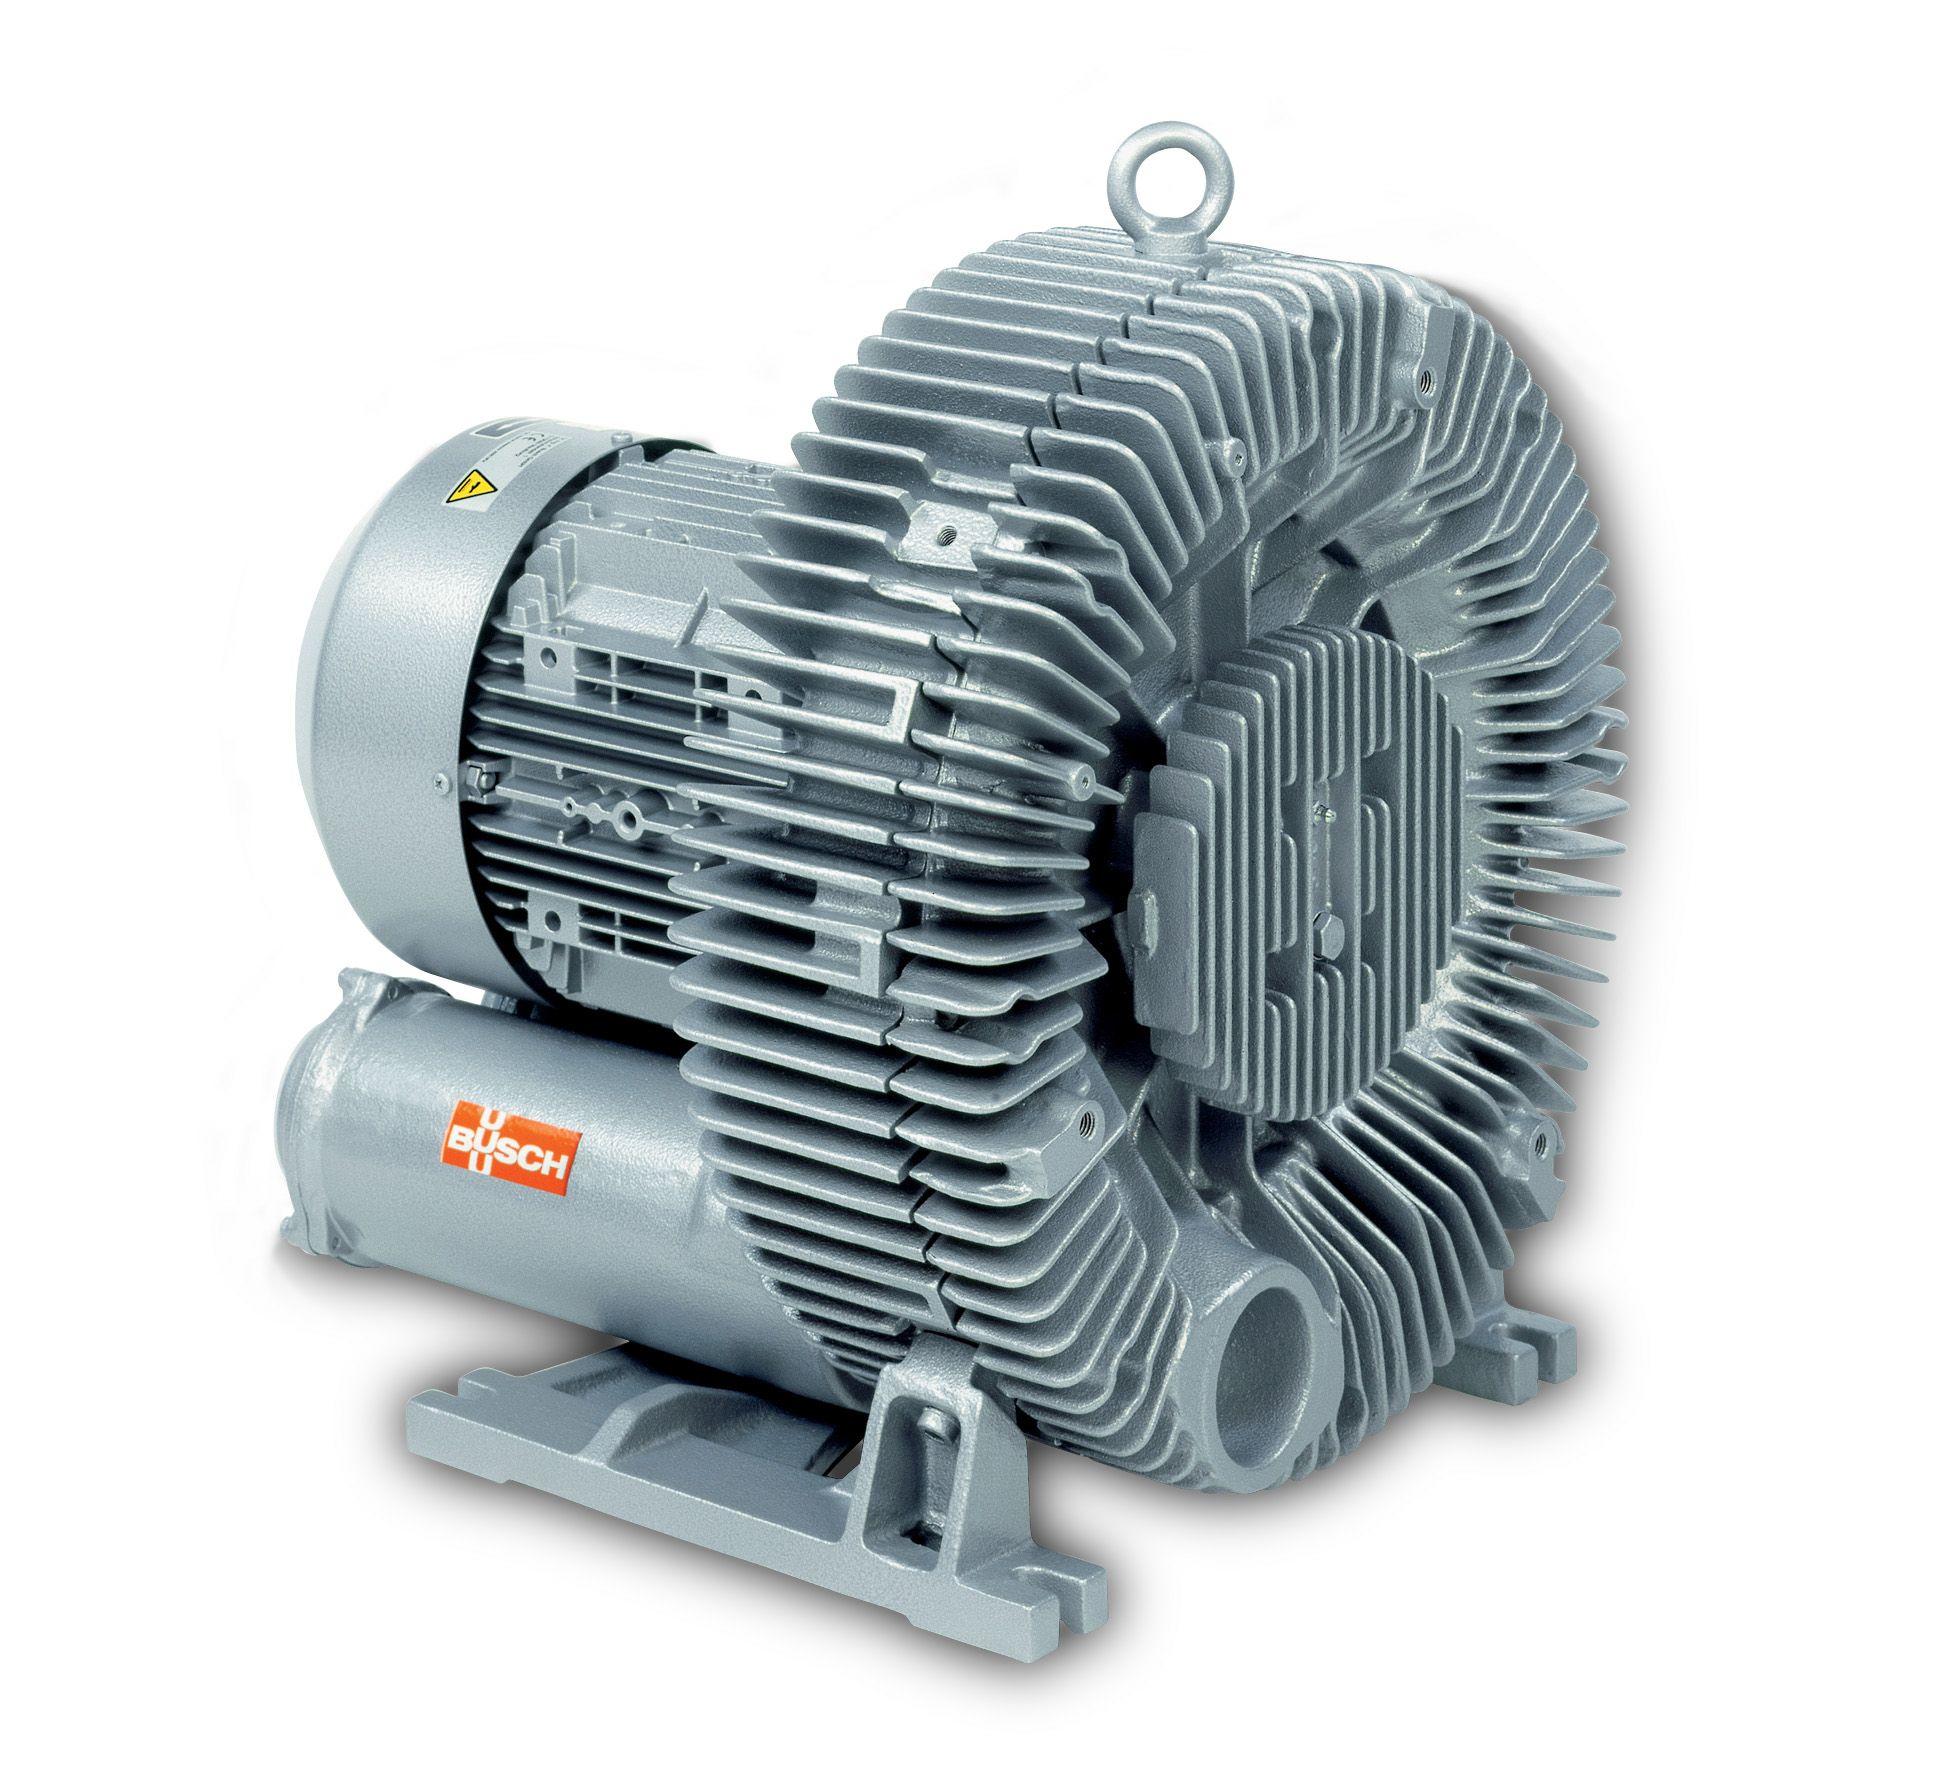 Kami goodnews technologies menjual berbagai macam blower for Portable dust collector motor blower